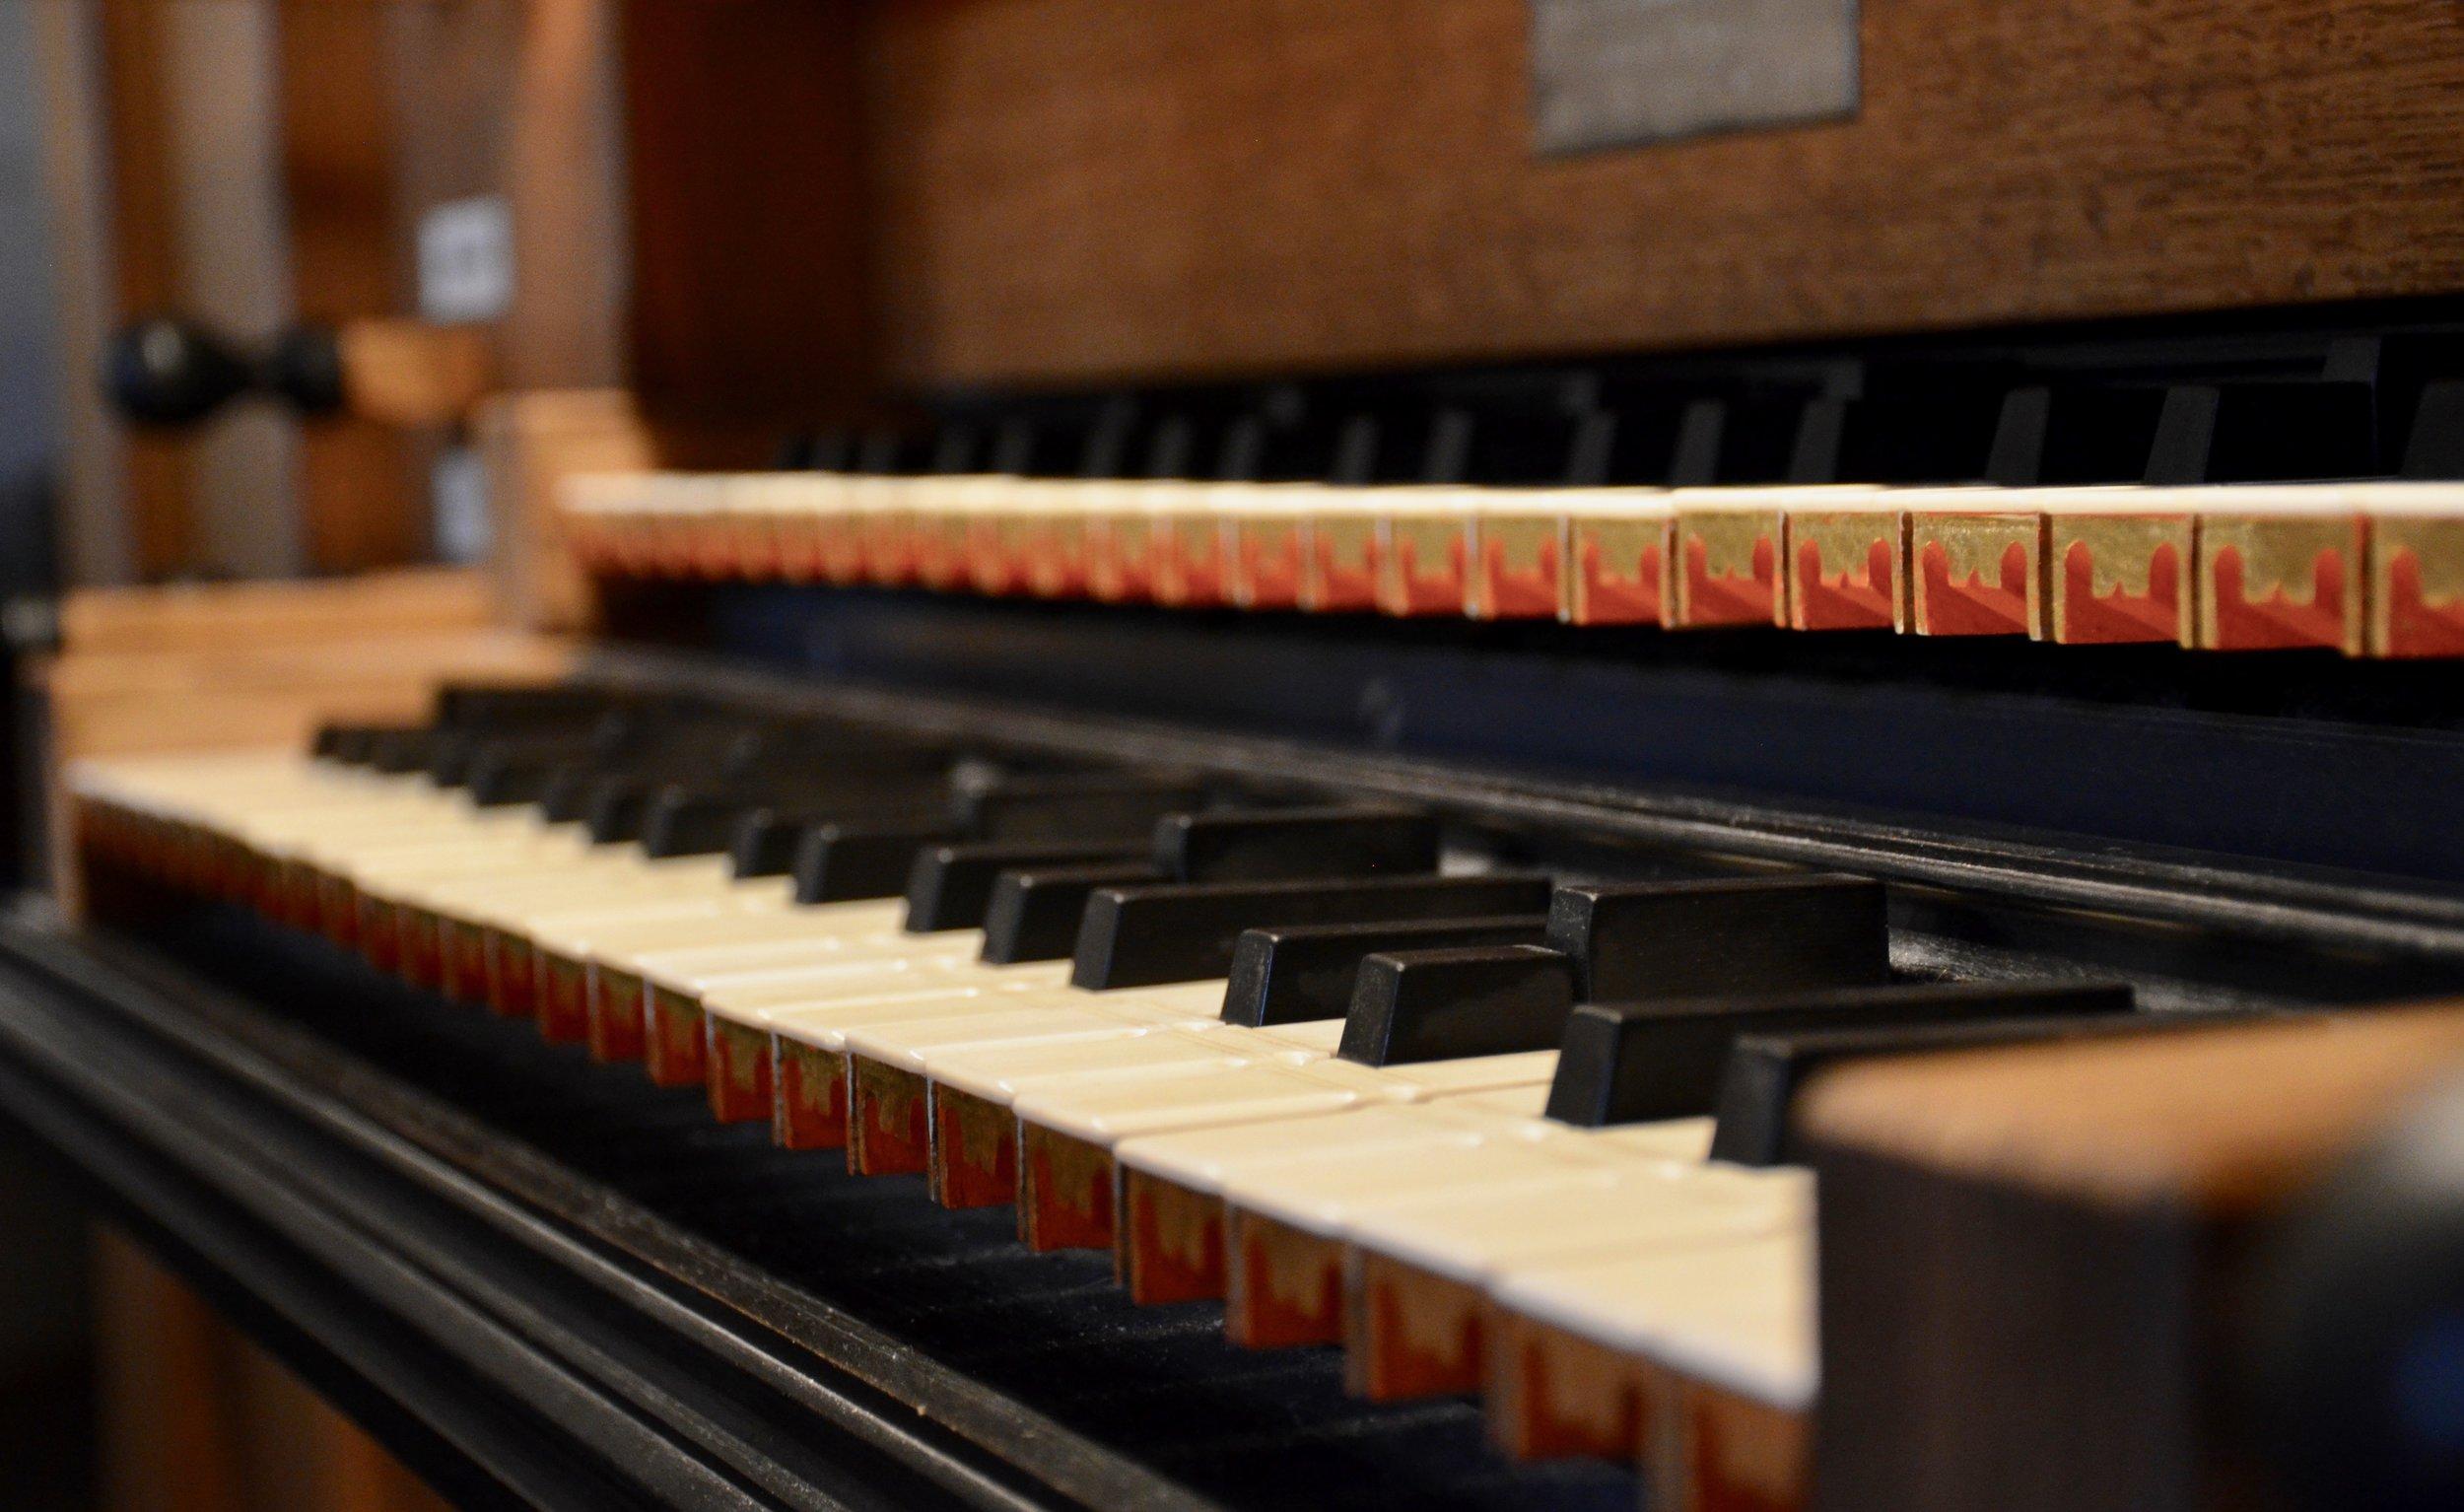 Keydesk detail, with sub-semitones, 1992 Brombaugh organ, Haga Church, Göteborg, Sweden.